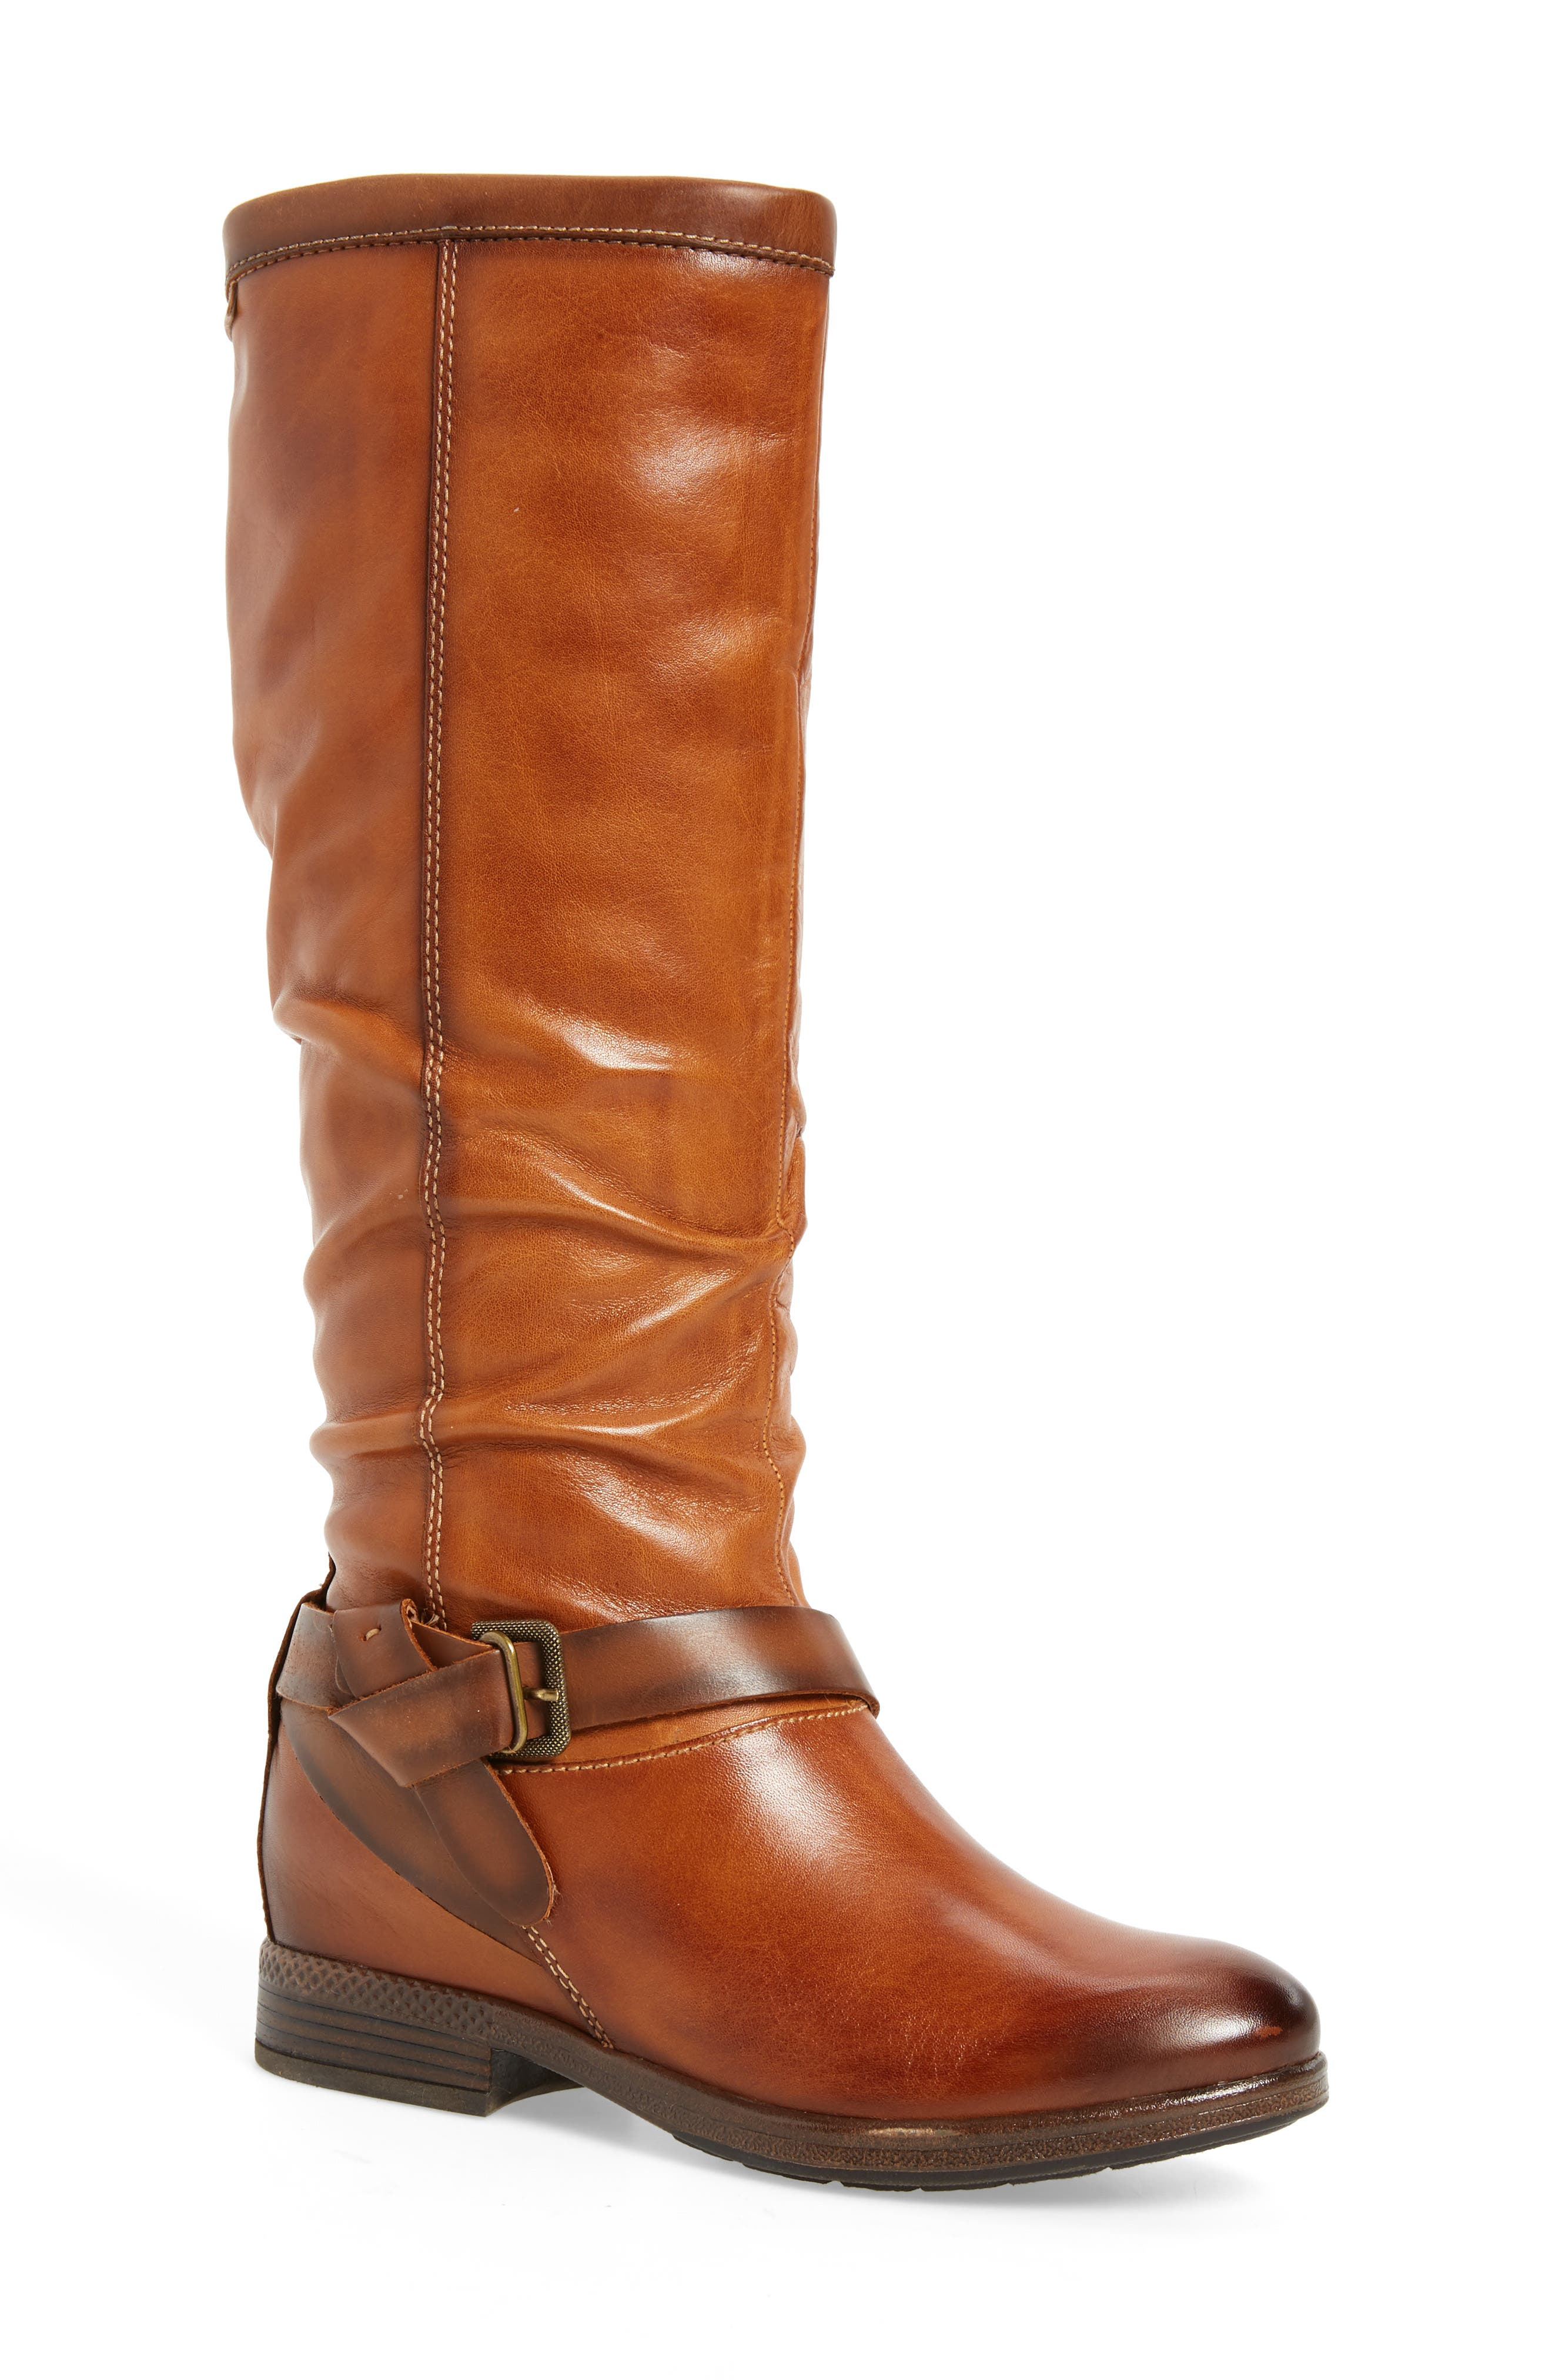 Ordino Knee High Boot,                         Main,                         color, Brandy Cuero Leather